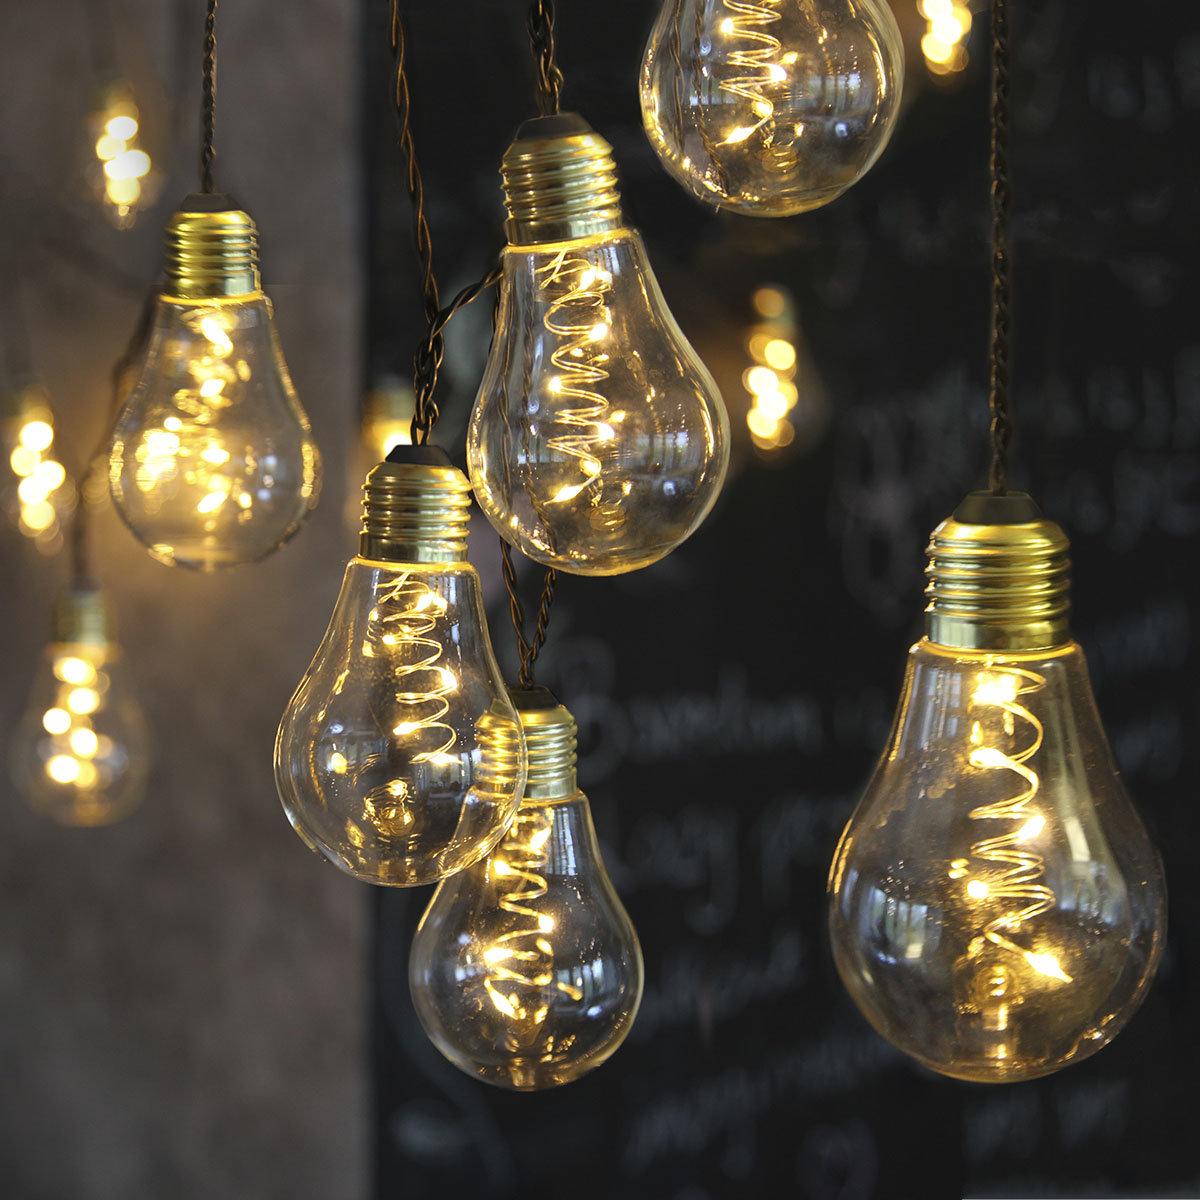 LED-Lichterkette Glow, 10-teilig